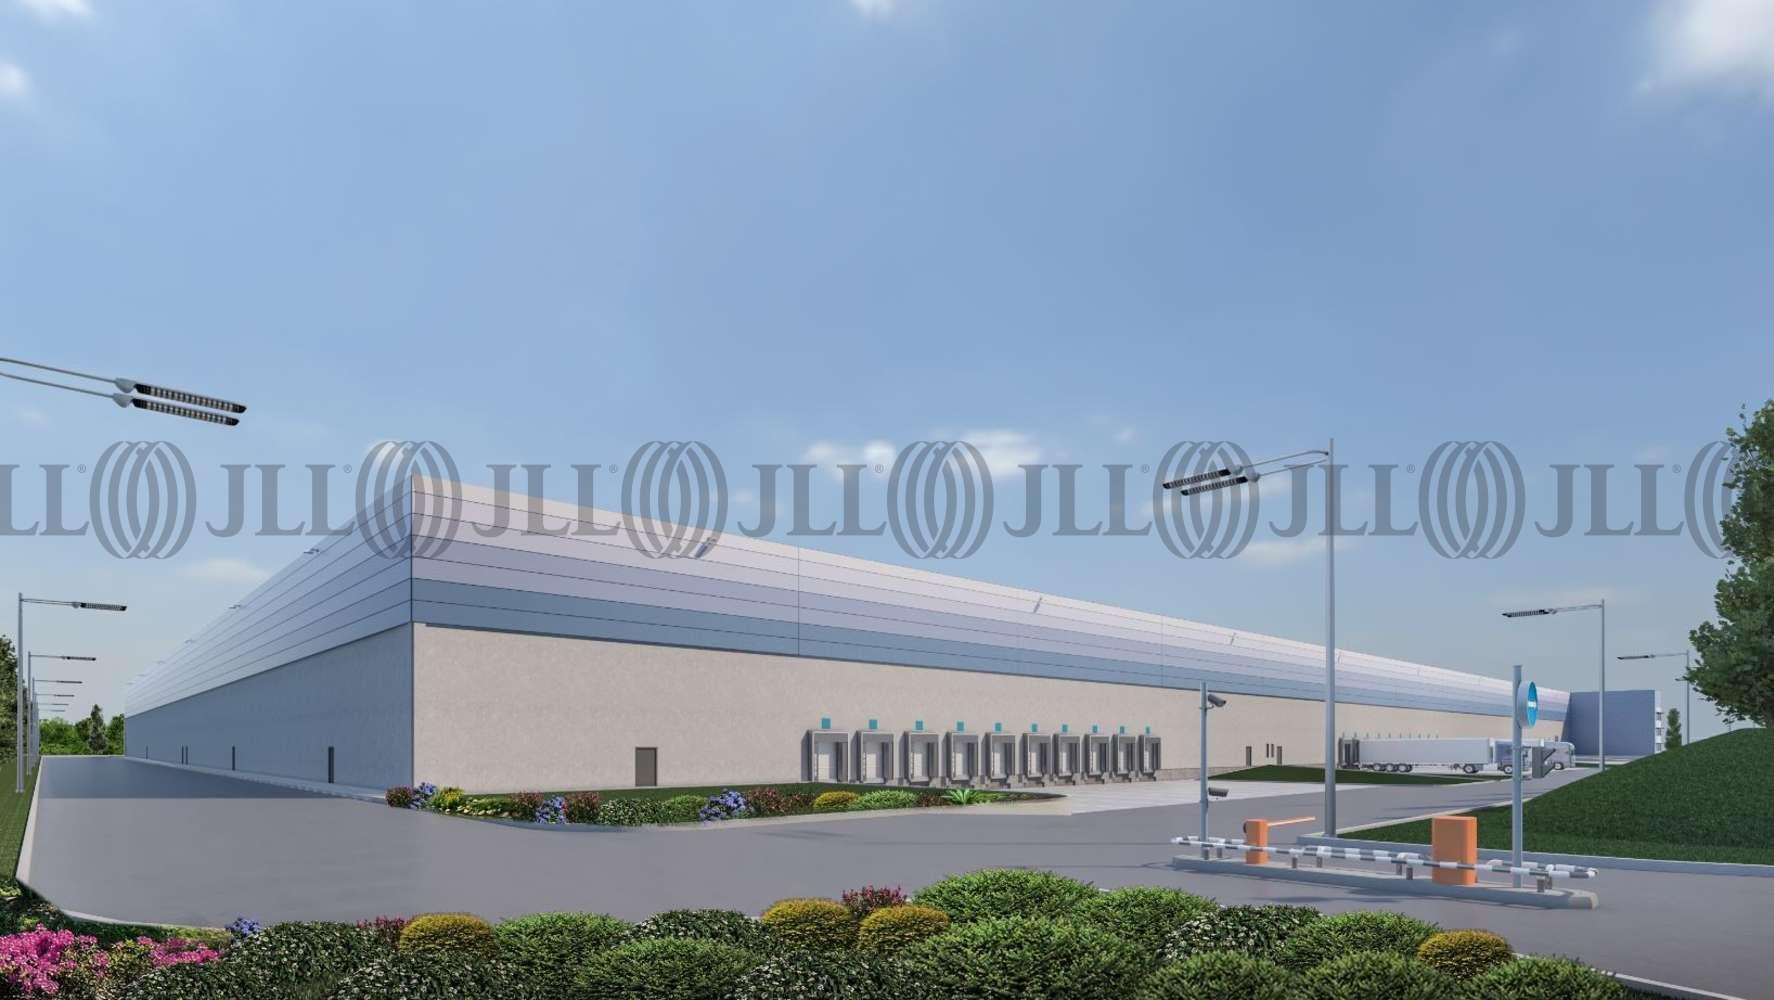 Magazzini industriali e logistici Monticelli d'ongina, 29010 - Monticelli d'Ongina - Piacenza